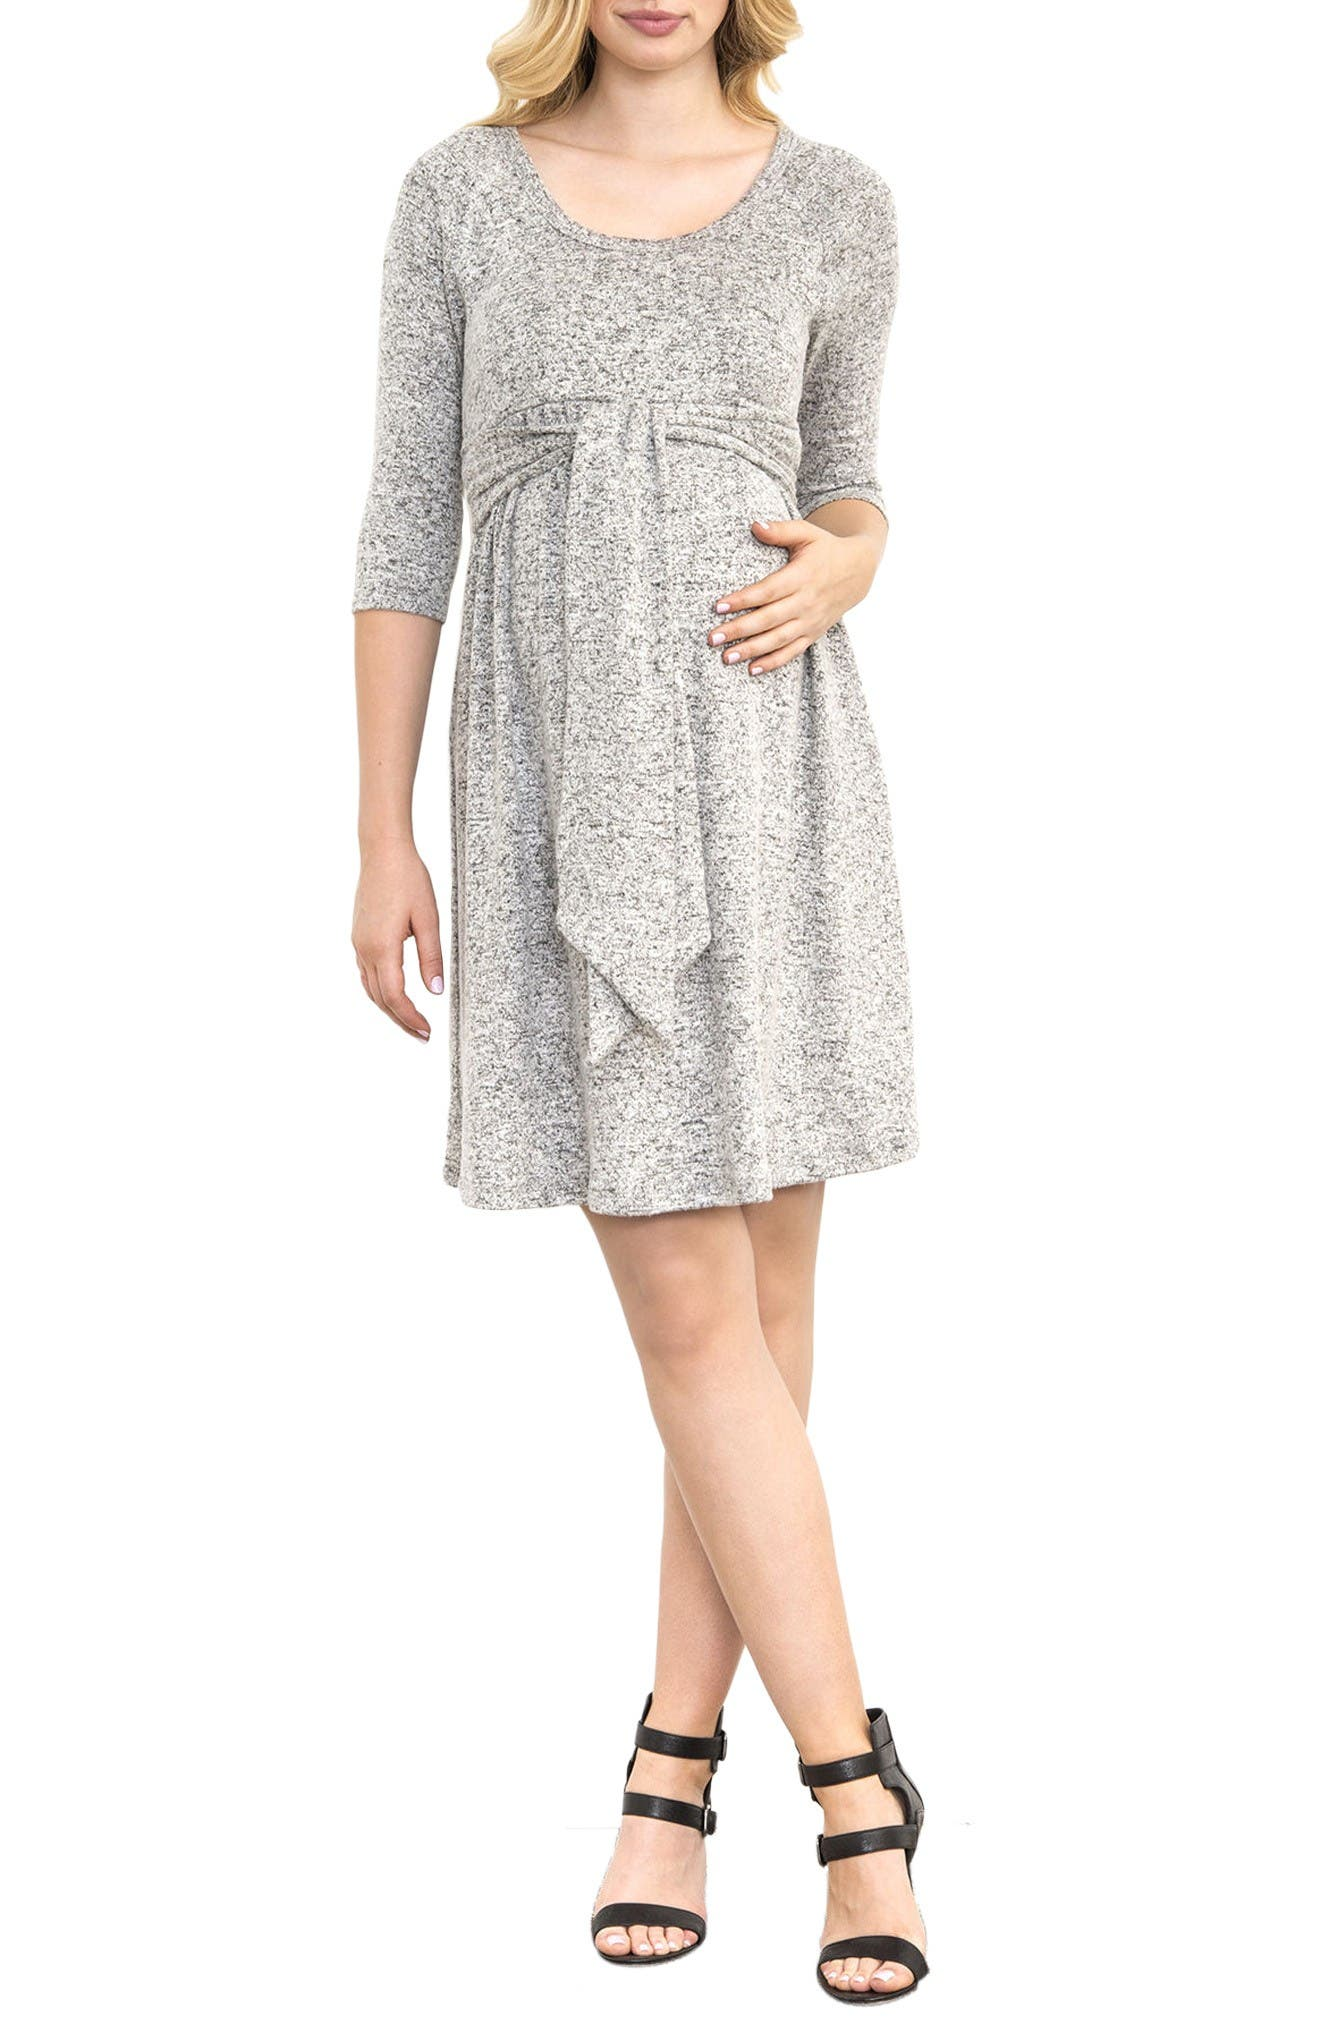 Scoop Neck Maternity Dress,                             Main thumbnail 1, color,                             Grey